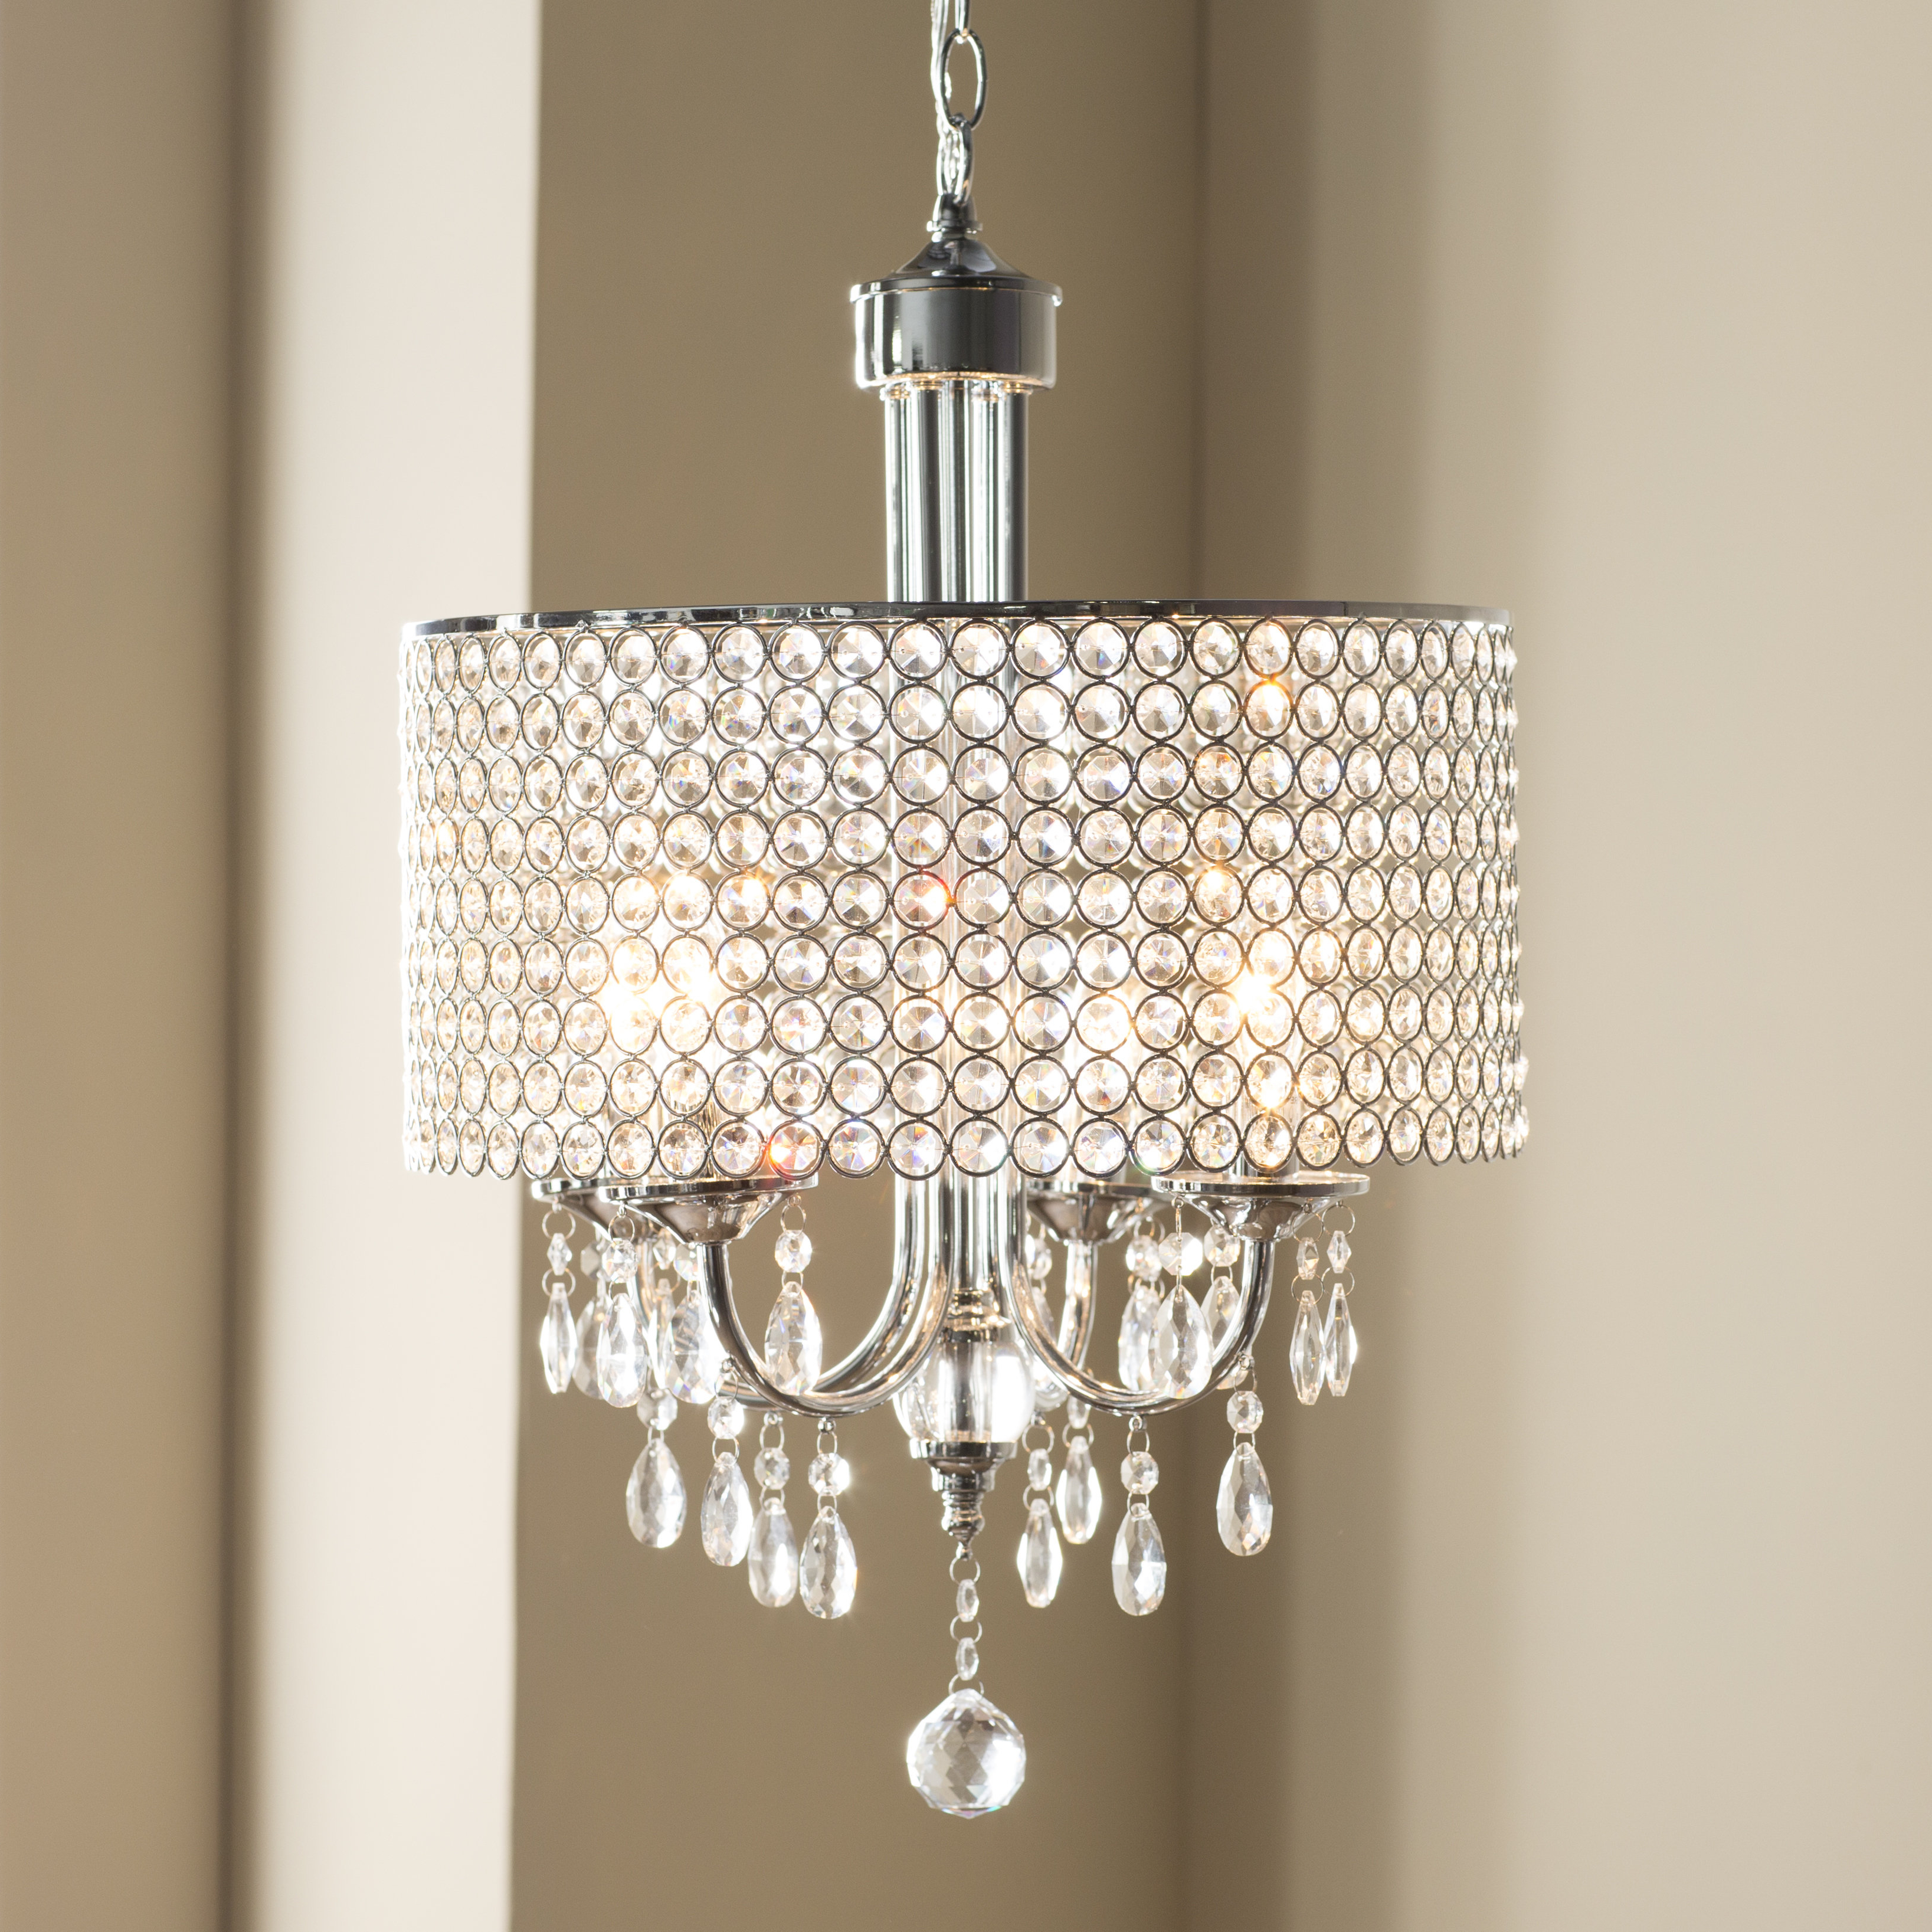 Favorite House Of Hampton Oldman 4 Light Crystal Chandelier Regarding Aldgate 4 Light Crystal Chandeliers (View 14 of 25)